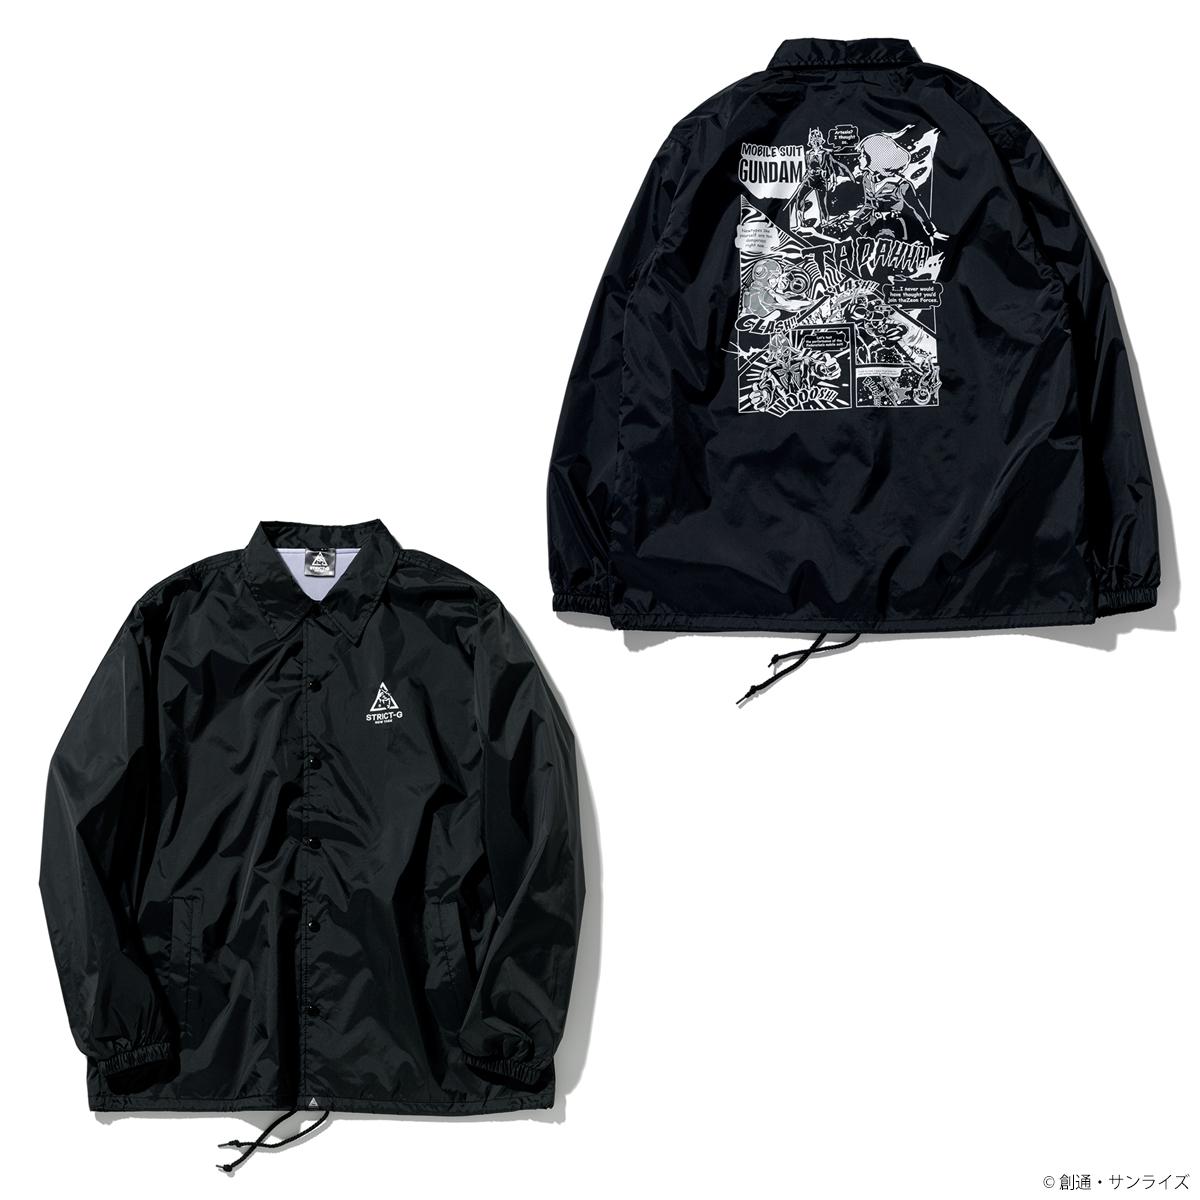 STRICT-G NEW YARK コーチジャケット コミック柄